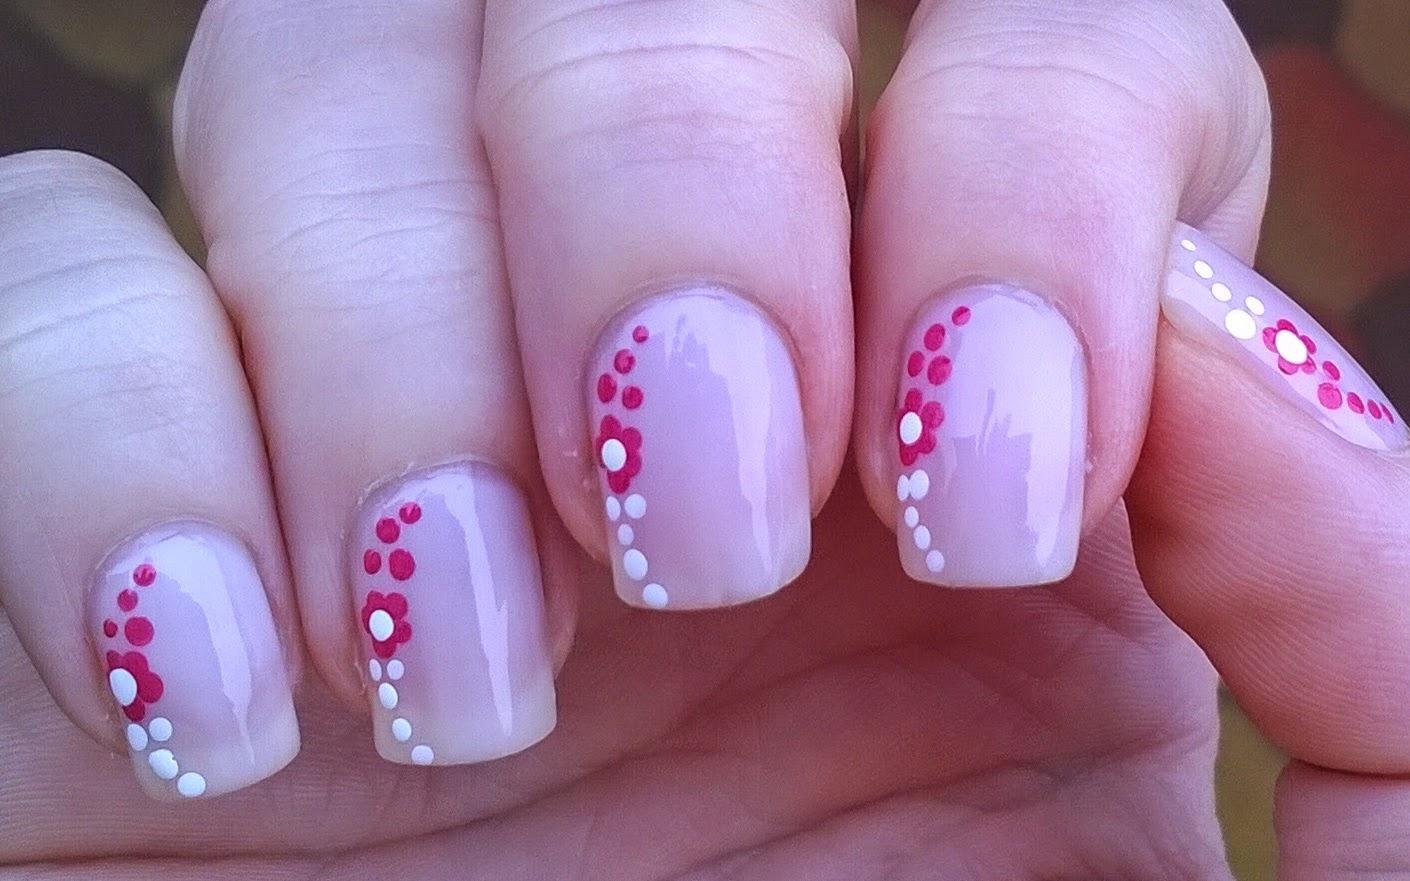 Life World Women: Pastel pink nail art with dotting tool design